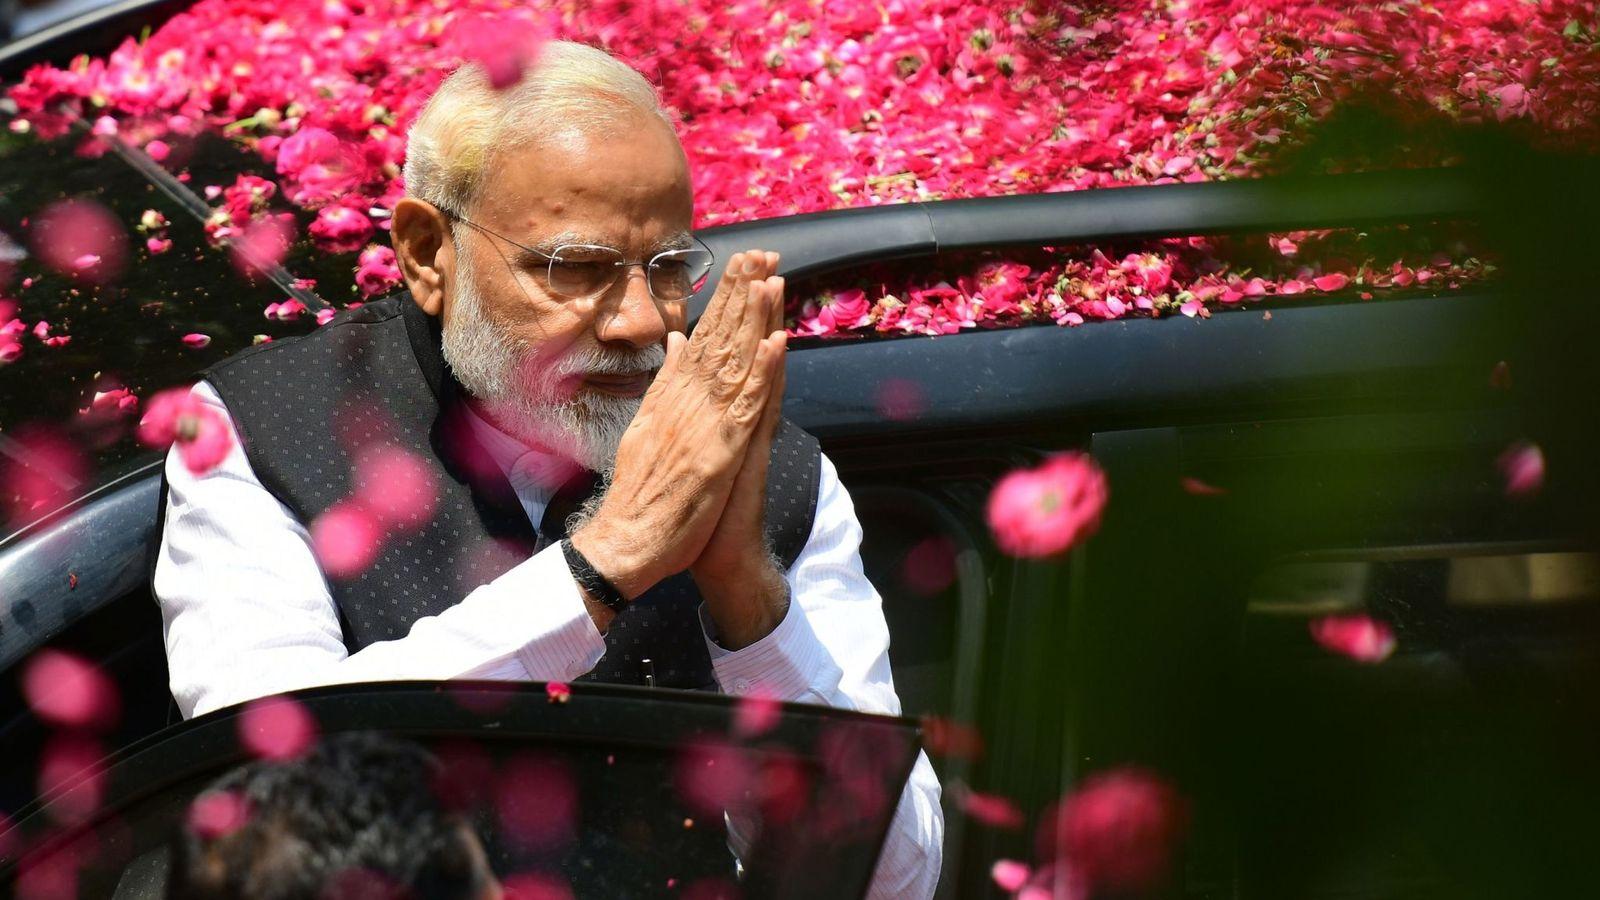 Trinamool Congress, Mamata Banerjee, Narendra Modi, Prime Minister, Bharatiya Janta Party, Swearing-in ceremony, Political violence, West Bengal, Politics news